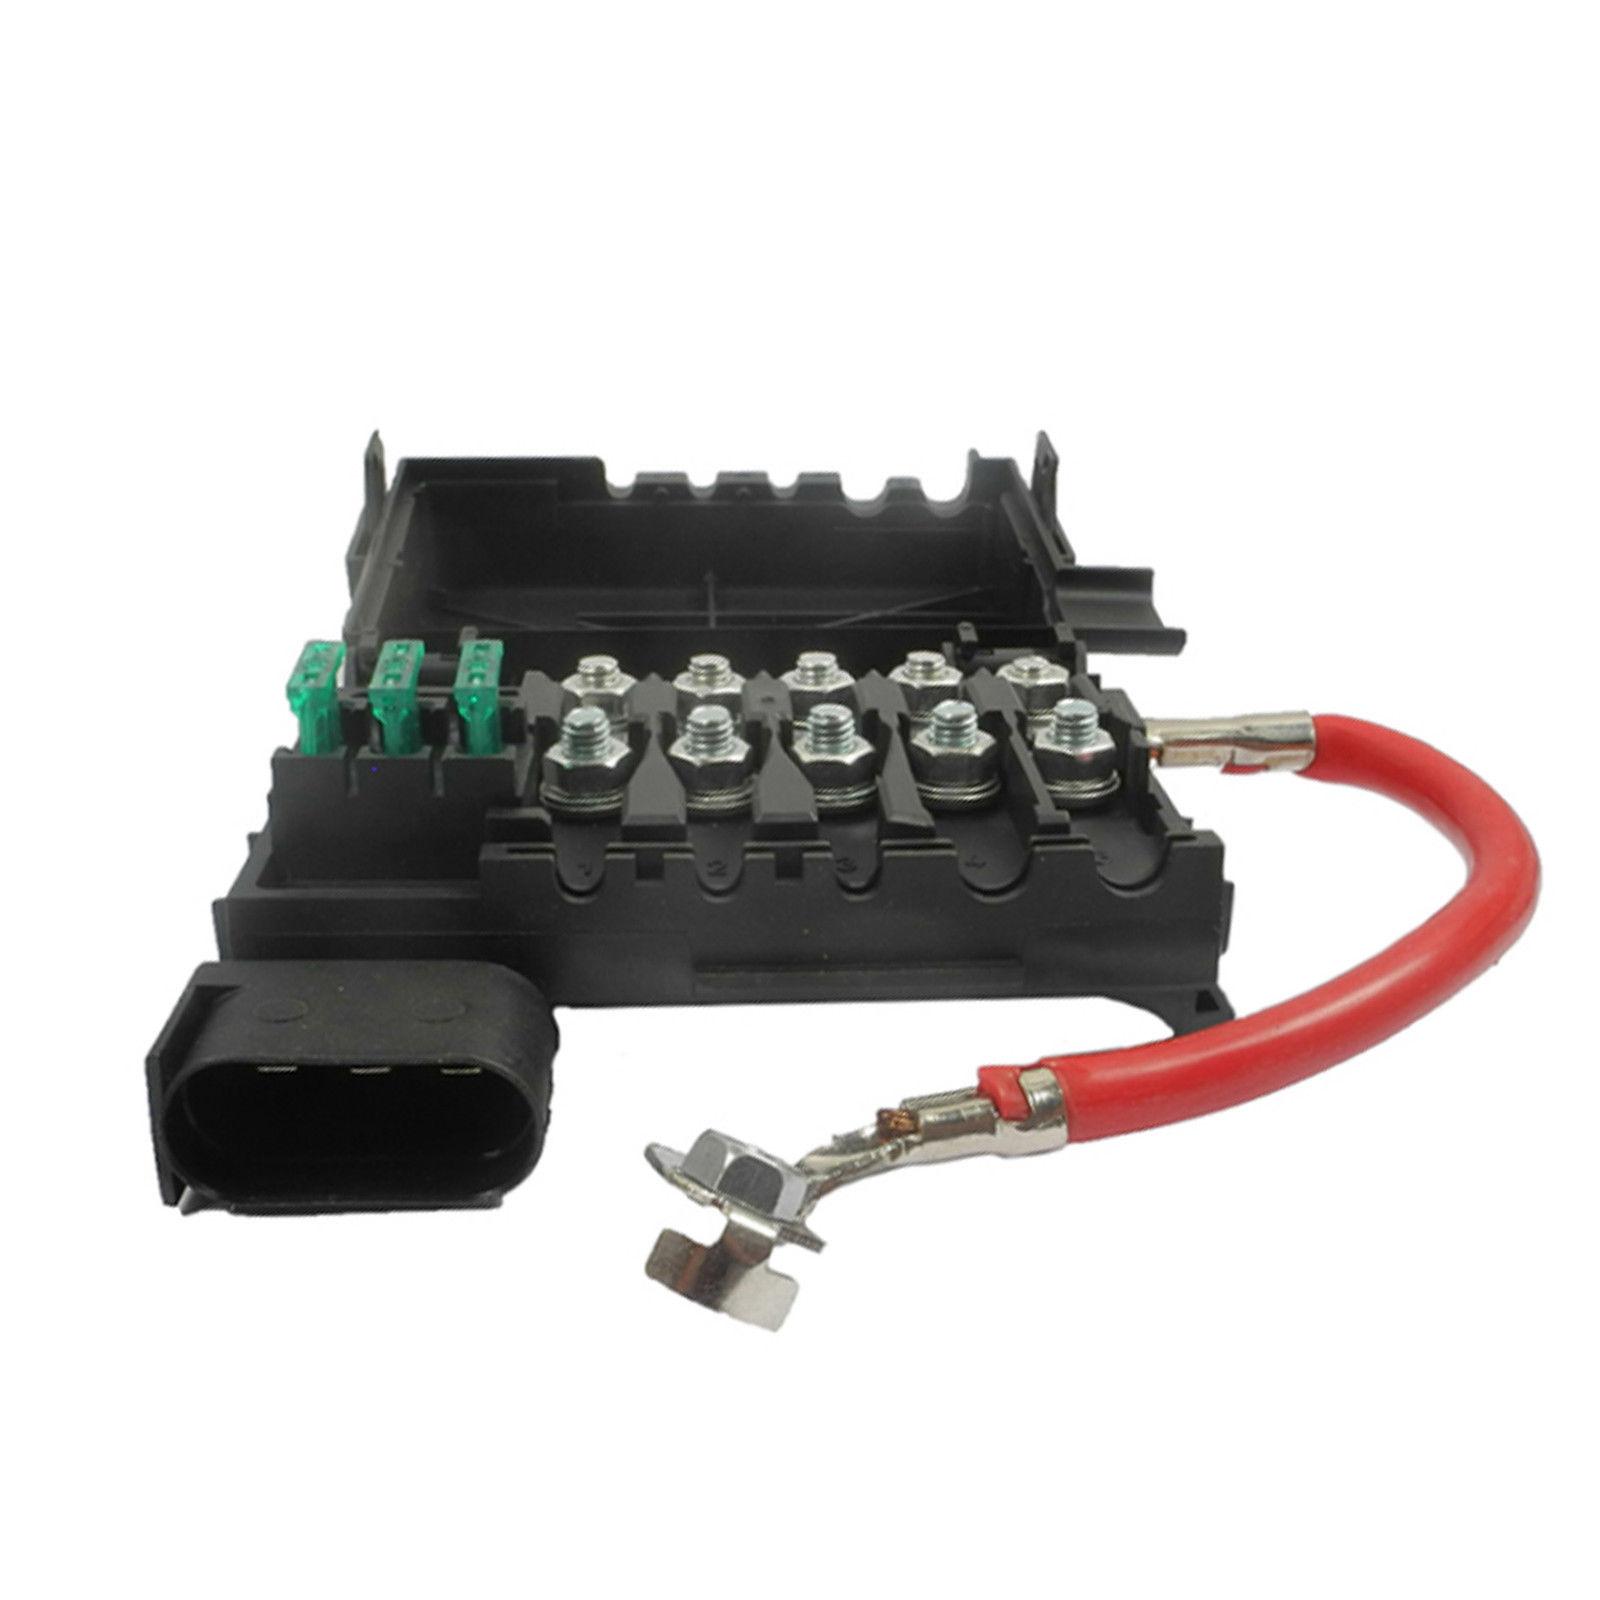 hight resolution of details about oem fuse box for vw beetle golf jetta 1 8l 1 9l 2 0l 2 8l 1j0937617d c061m